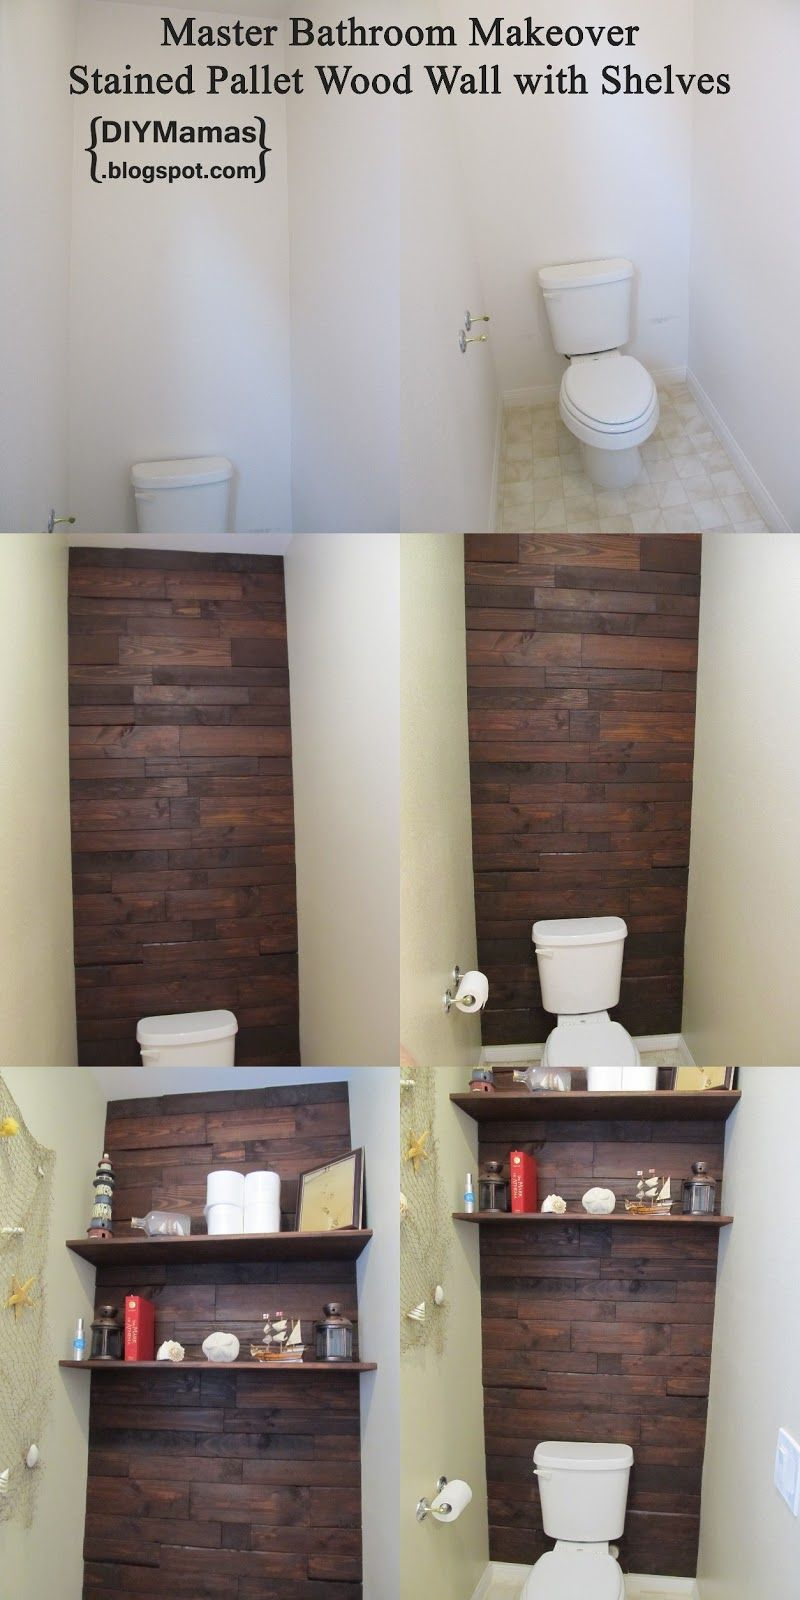 Pallet Wall Bathroom Pallet Wood Bathroom